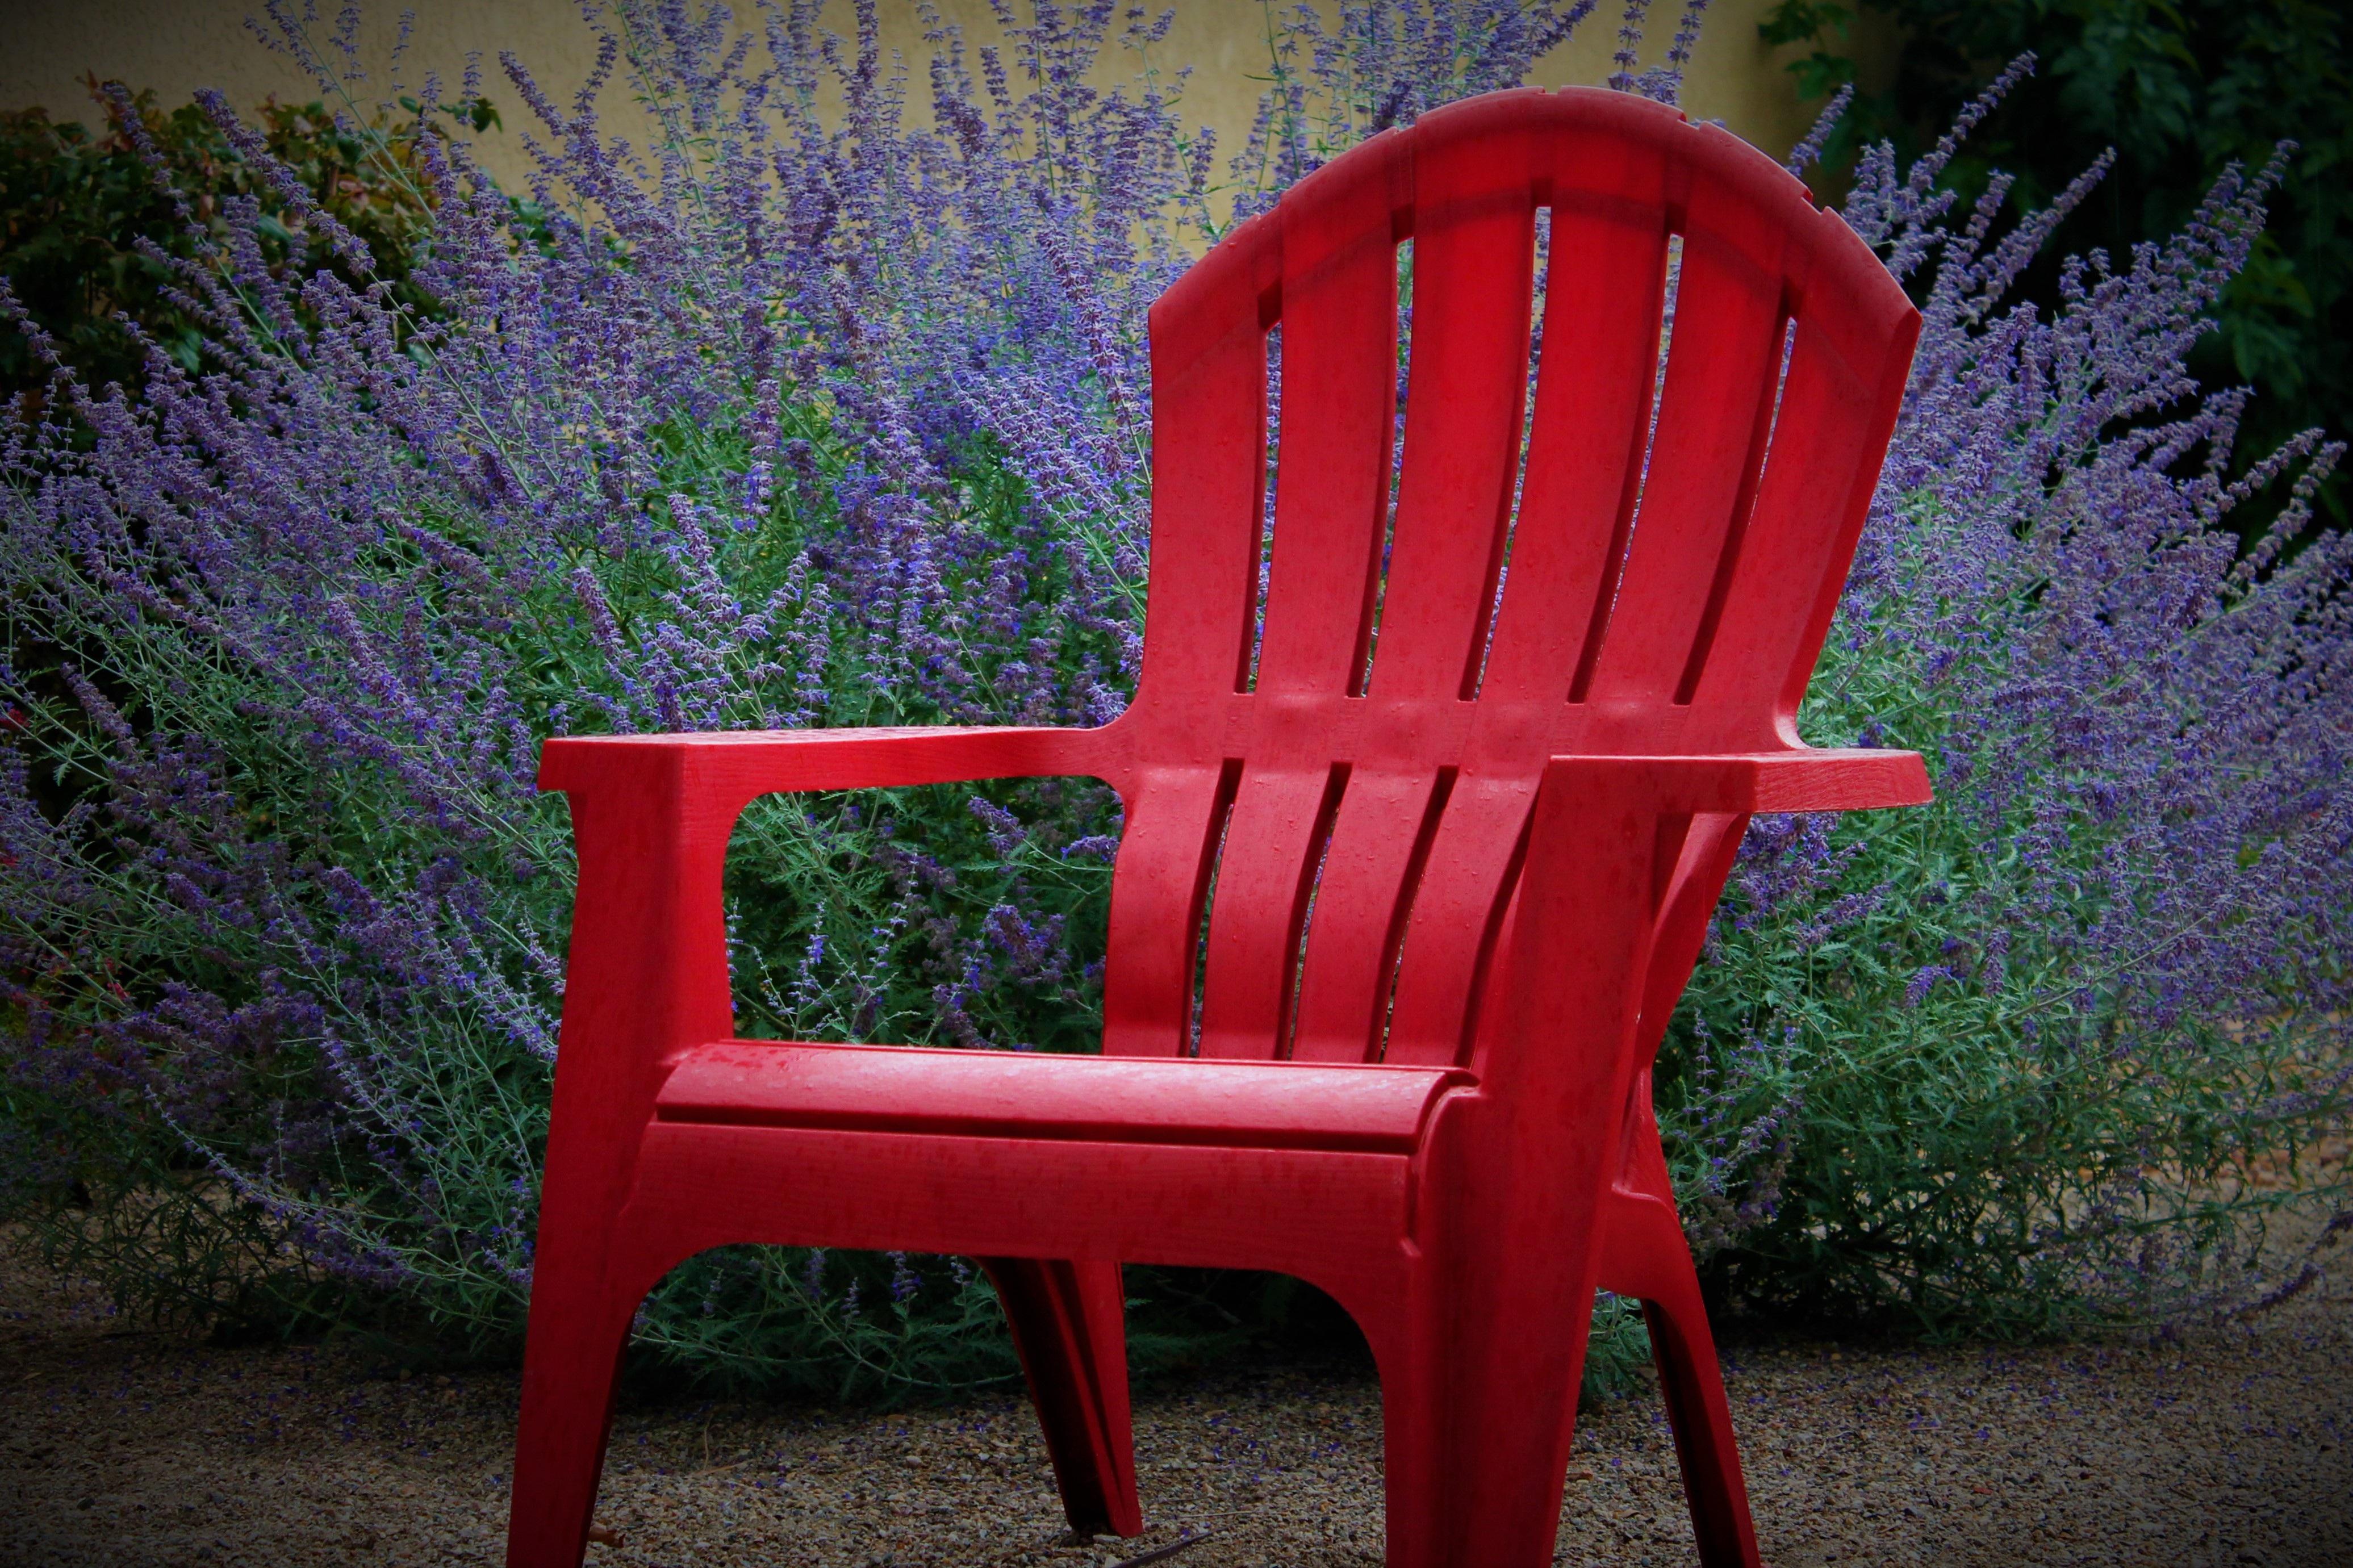 Fotos gratis : naturaleza, al aire libre, césped, silla, mojado ...